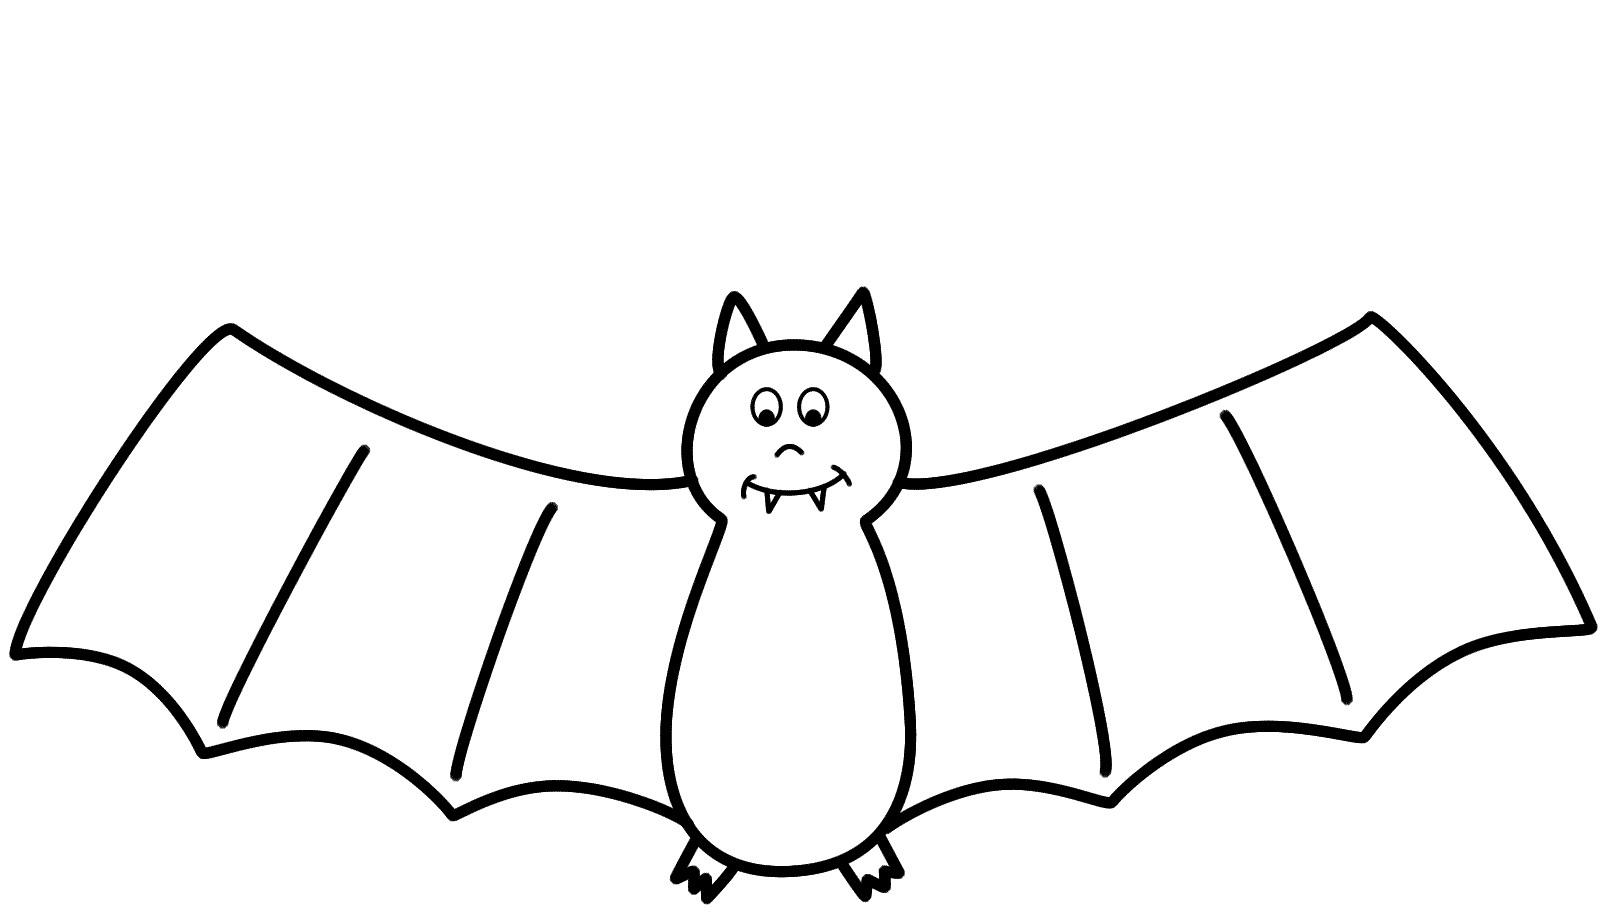 Bat Outline Drawing at GetDrawings | Free download